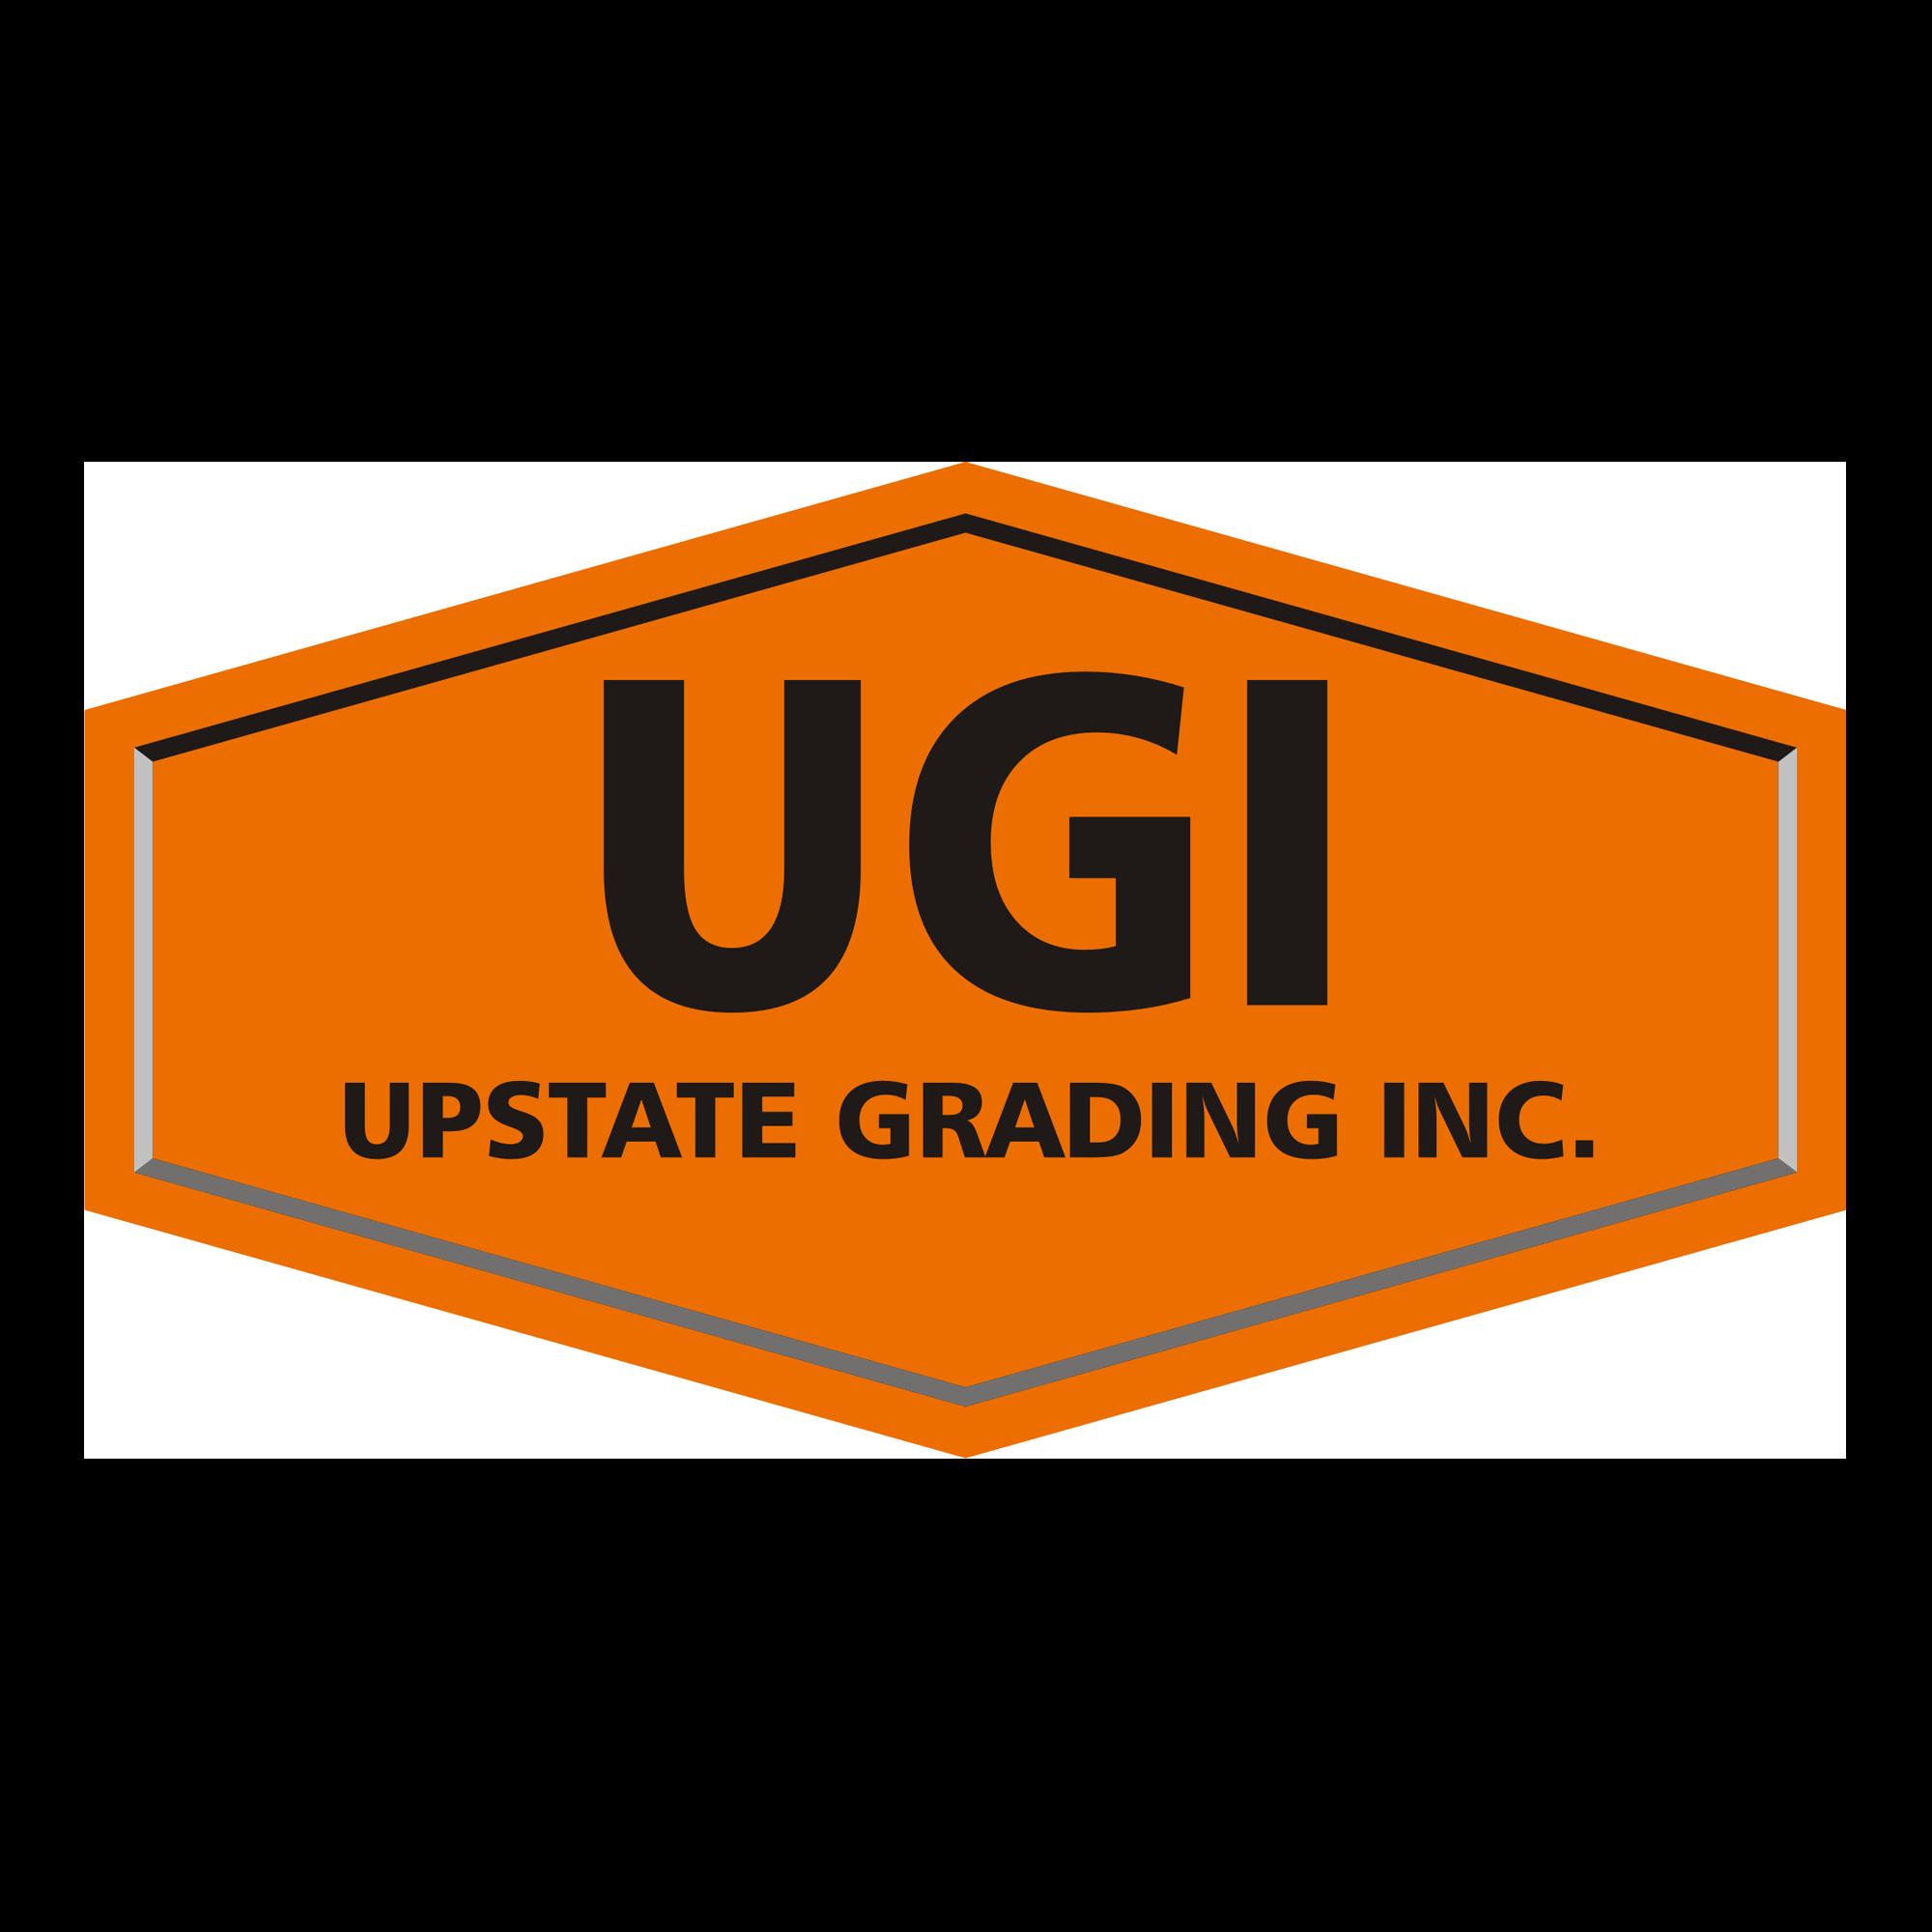 Upstate Grading Inc.